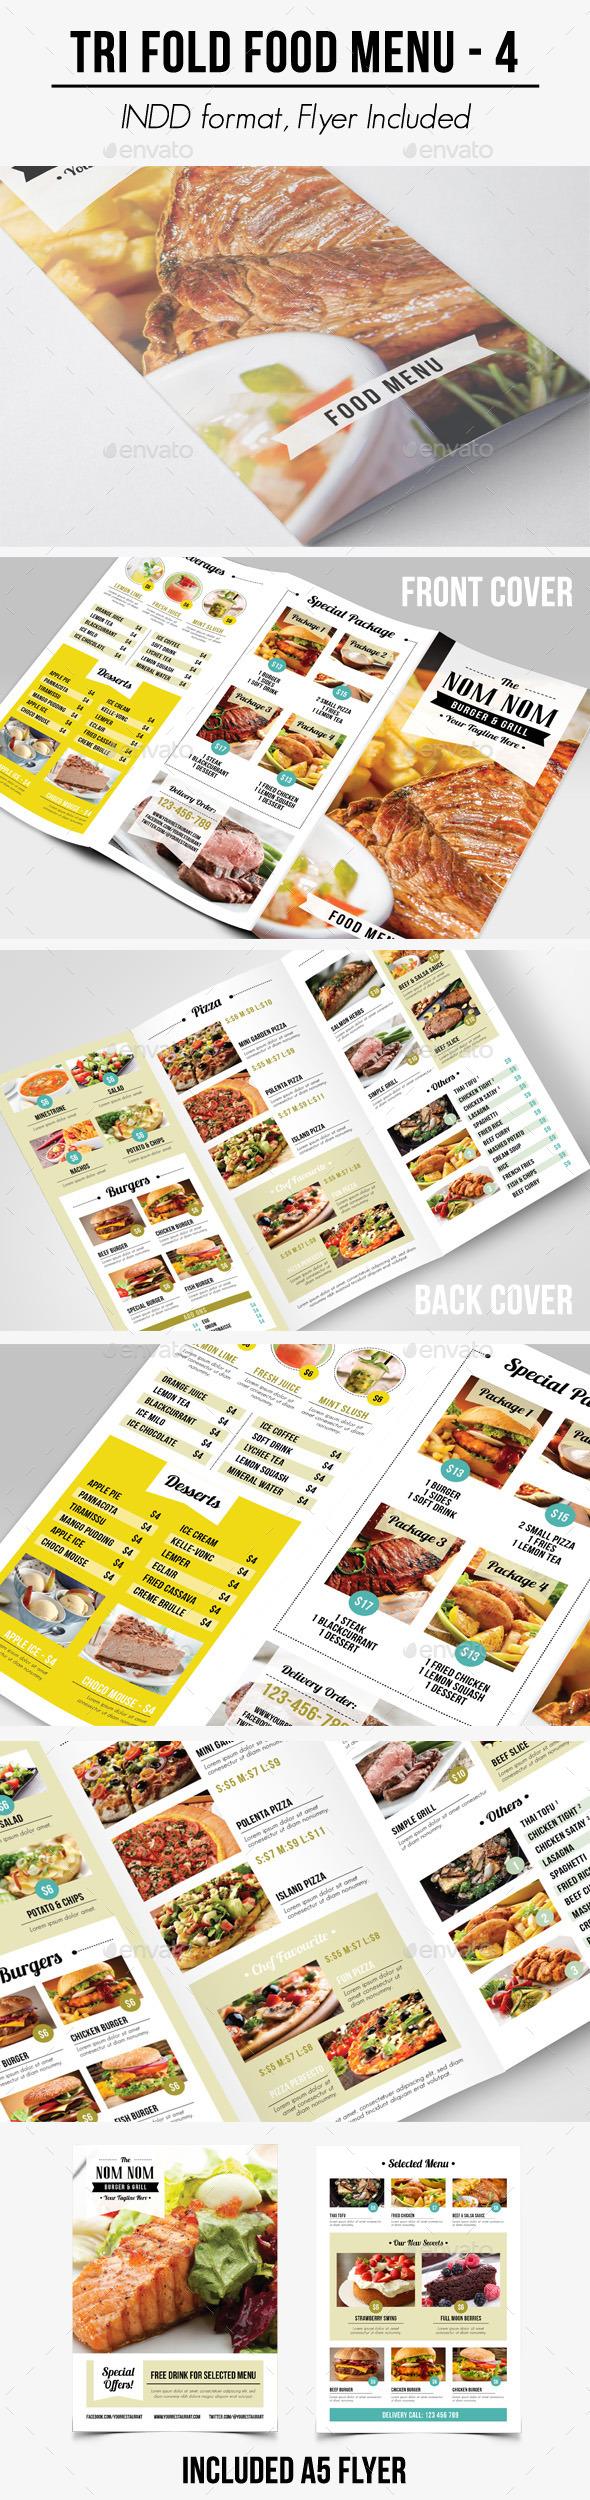 Tri Fold Food Menu - 4 - Food Menus Print Templates